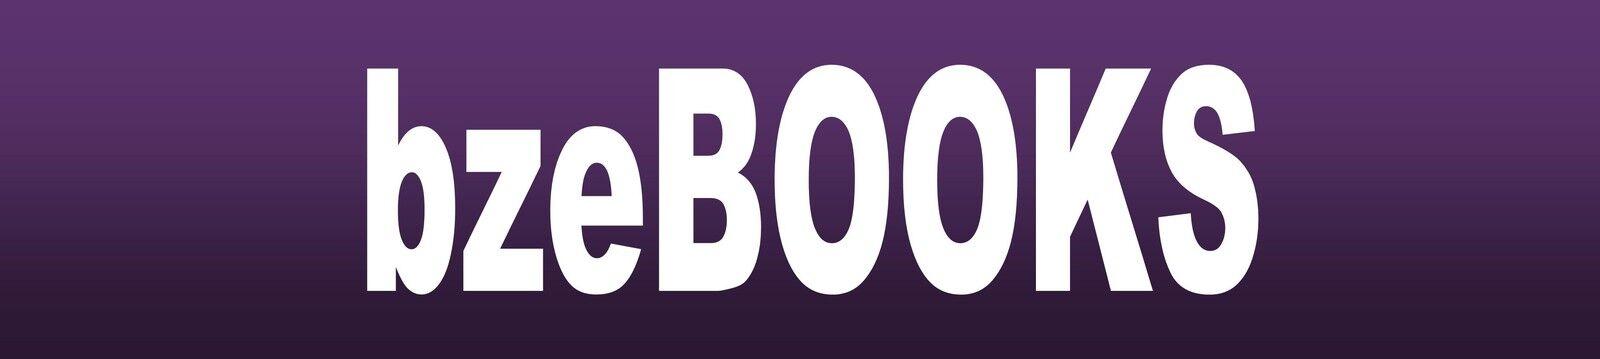 bzeBooks